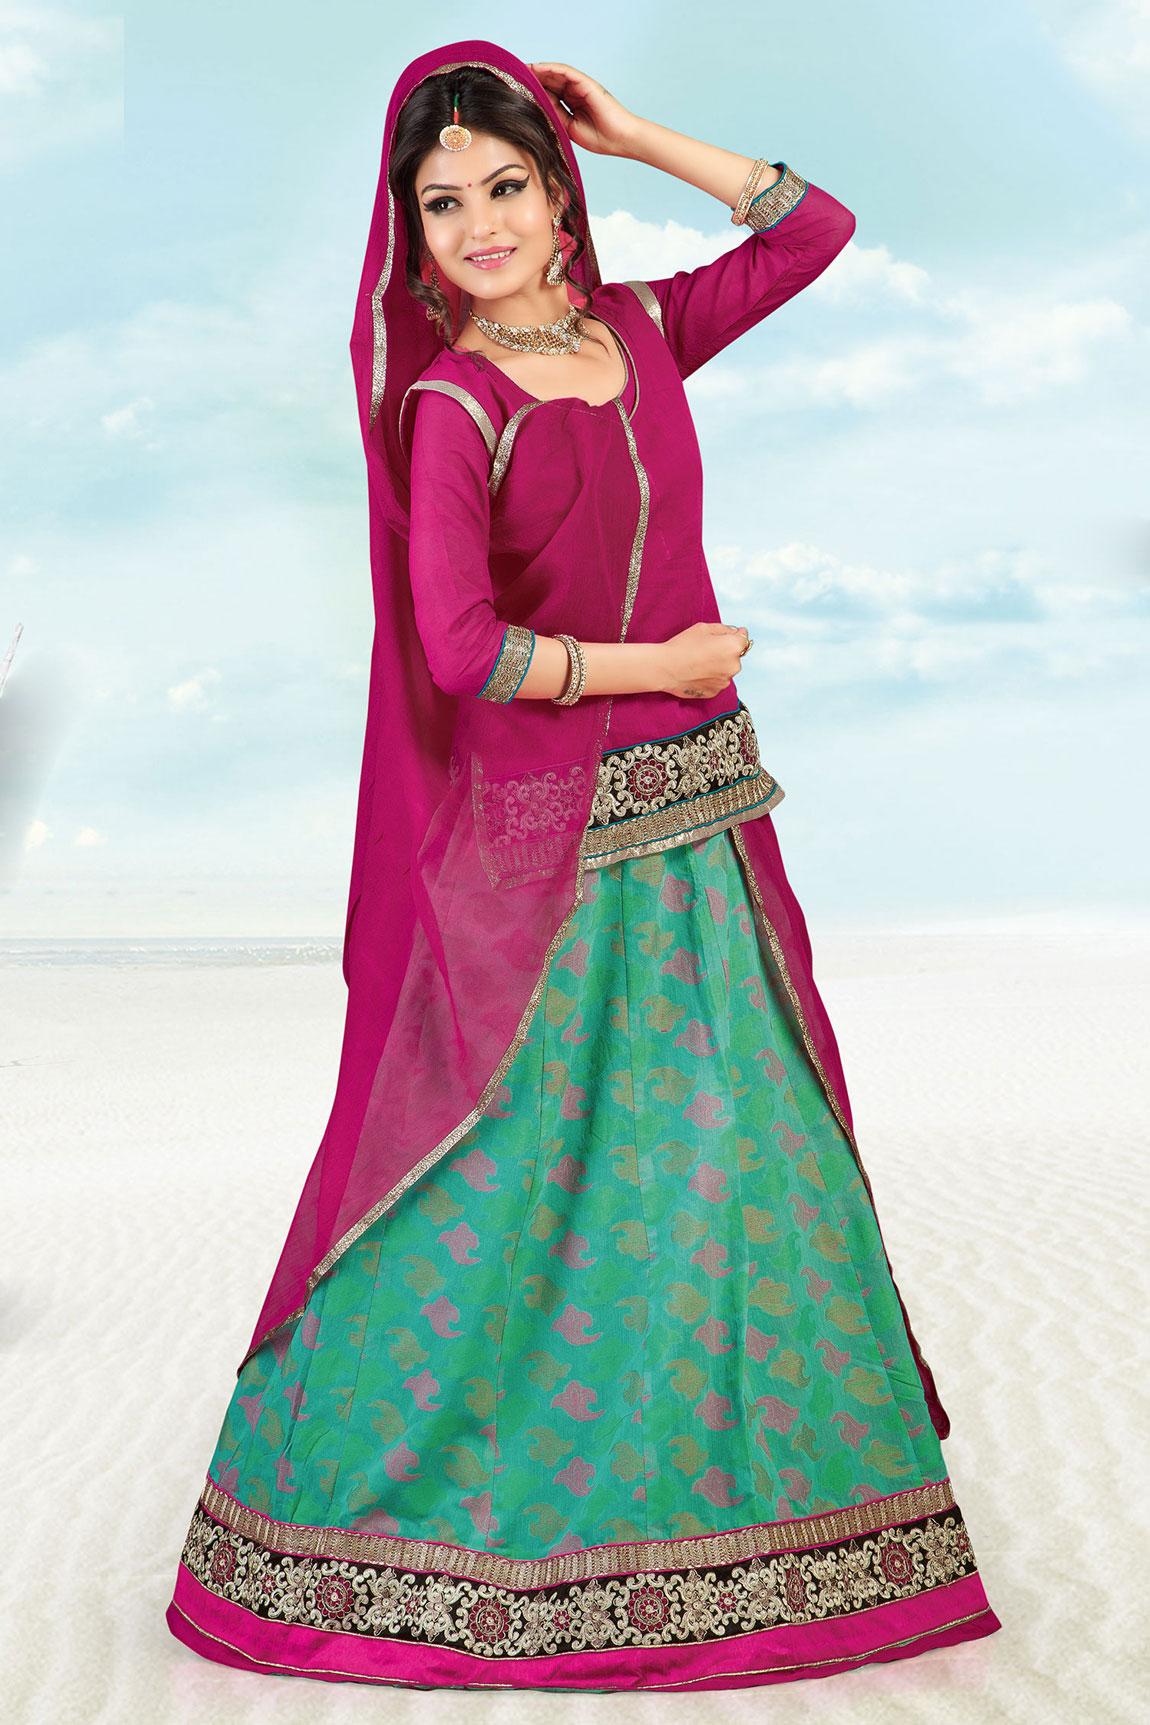 Beautiful Pin Rajasthani Dress Image Details On Pinterest